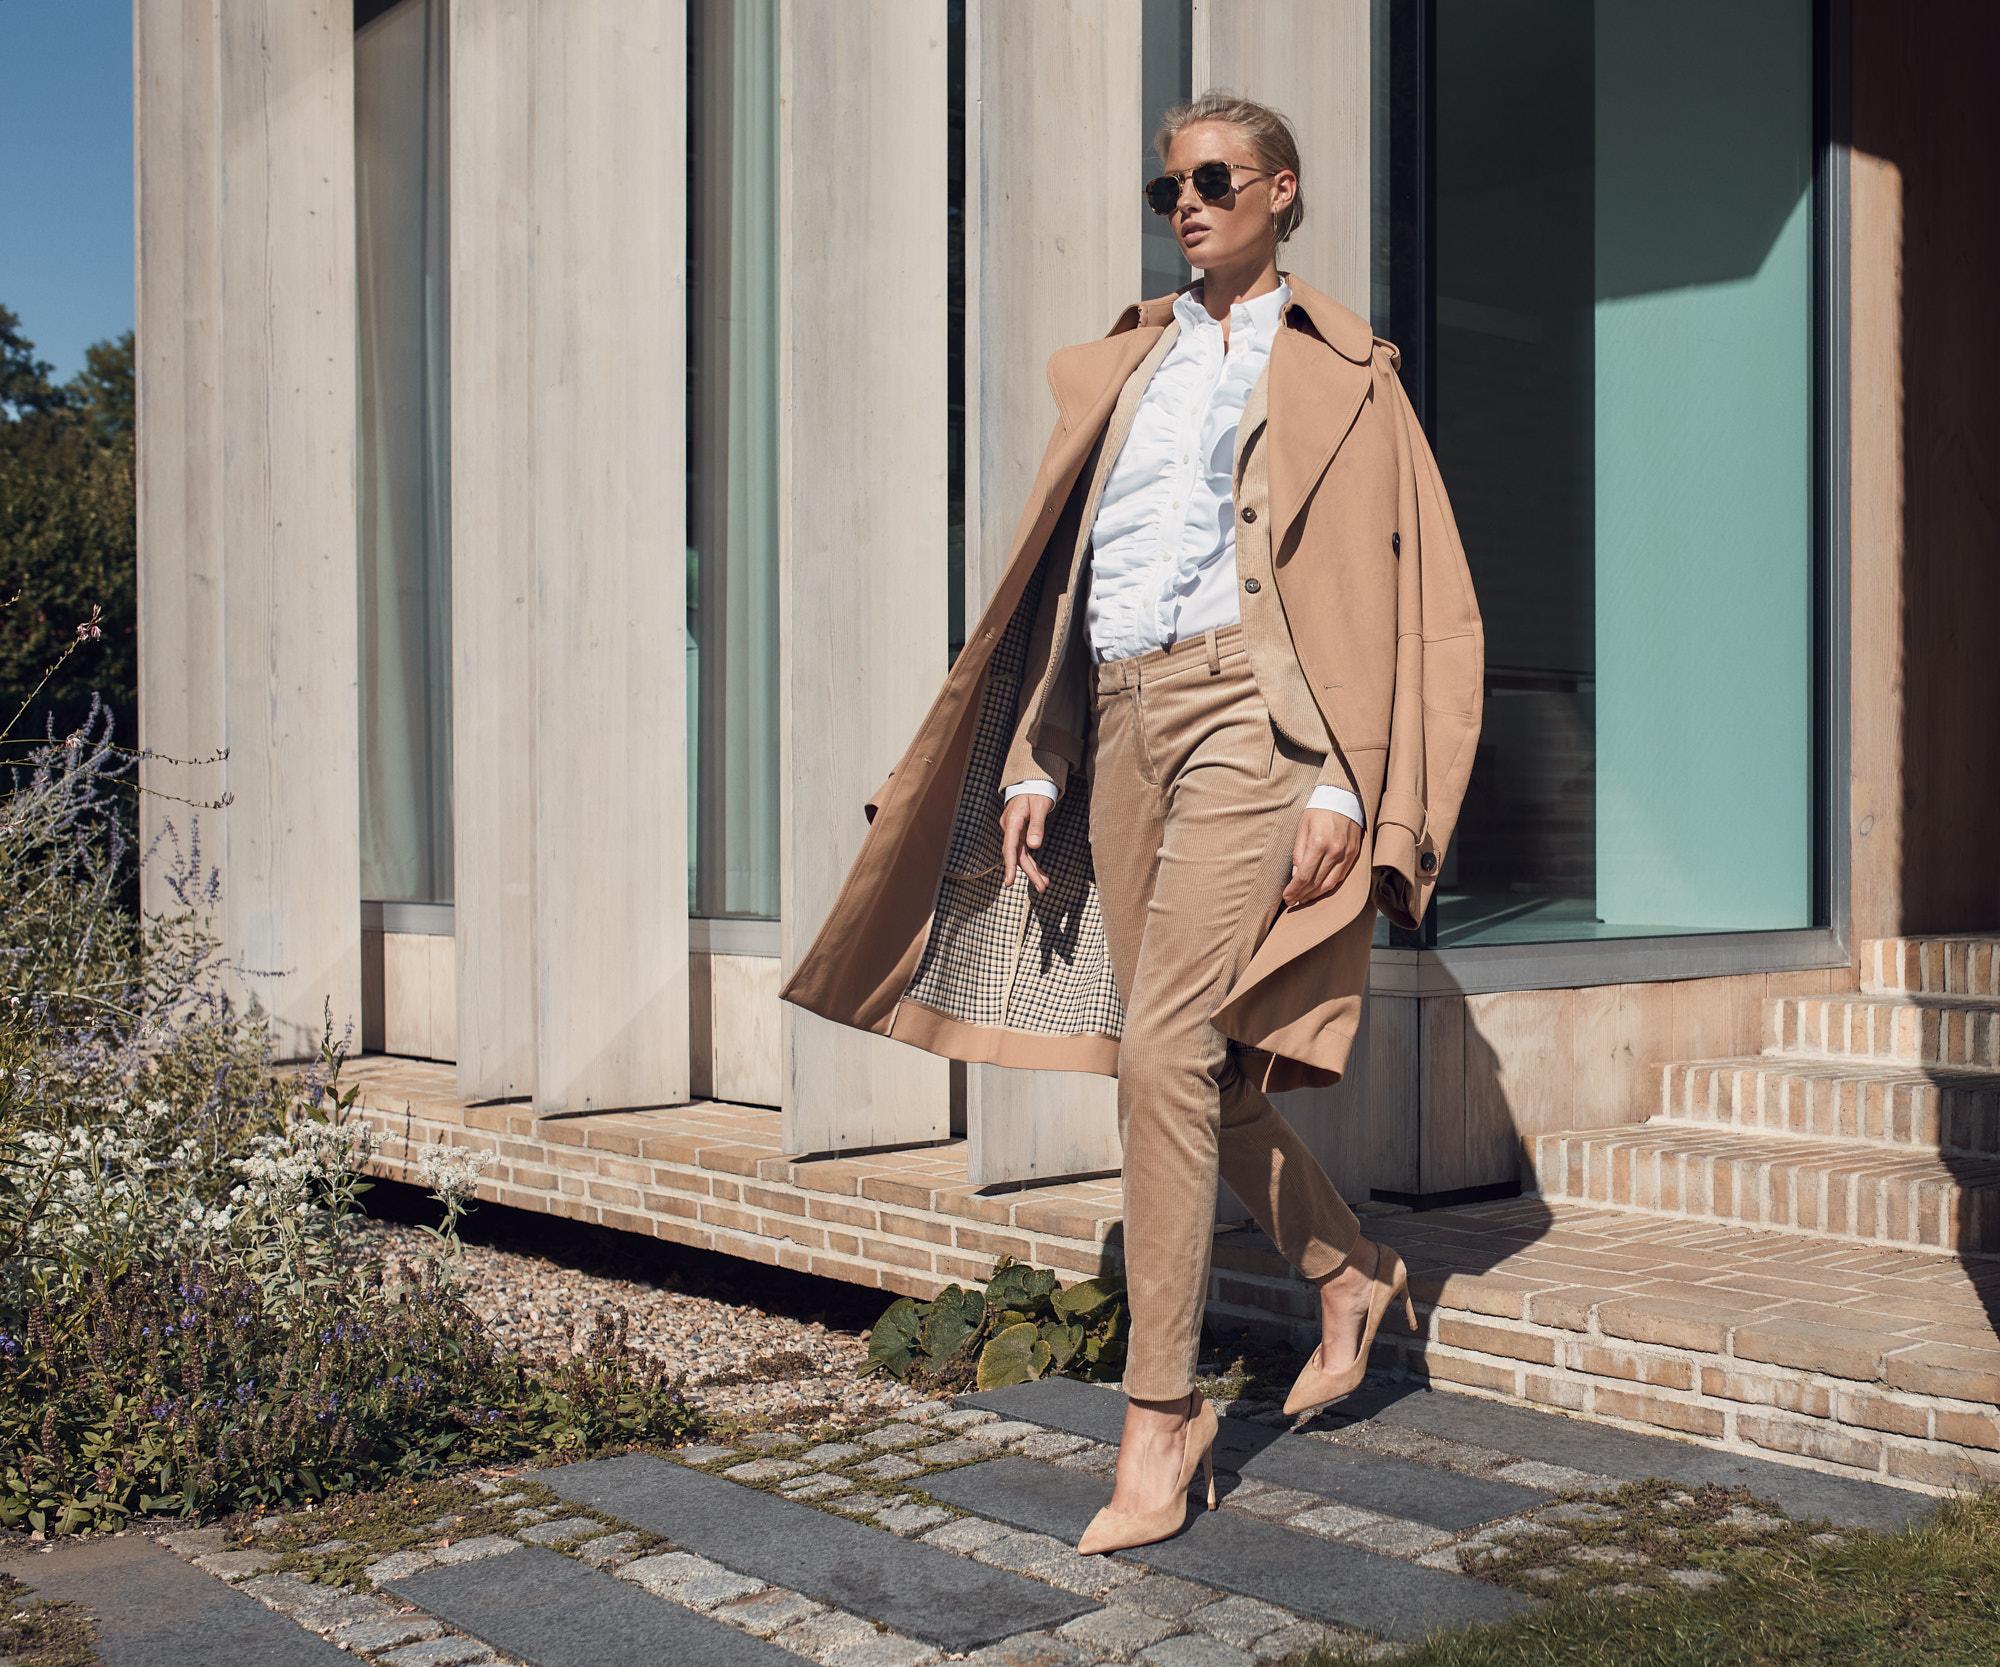 bernd-westphal-stillstars-vanlaack-women-auttum-winter-2020-fashion-still-life-photography-003